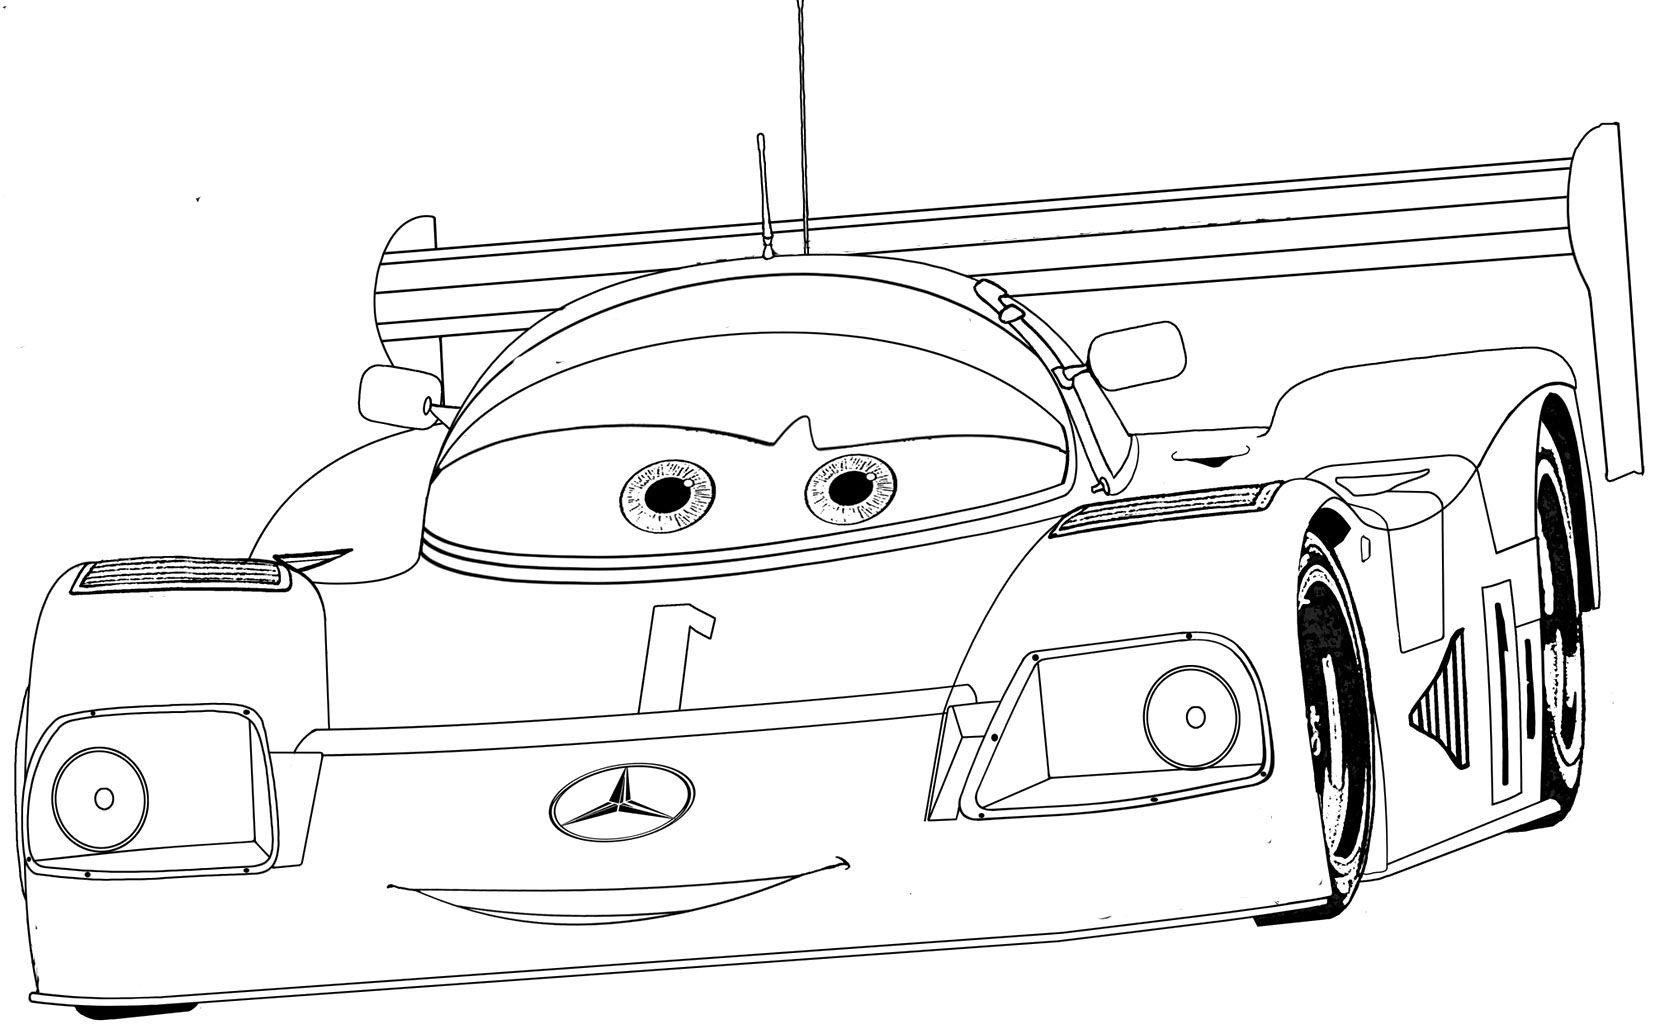 sauber mercedes benz c9 coloring page